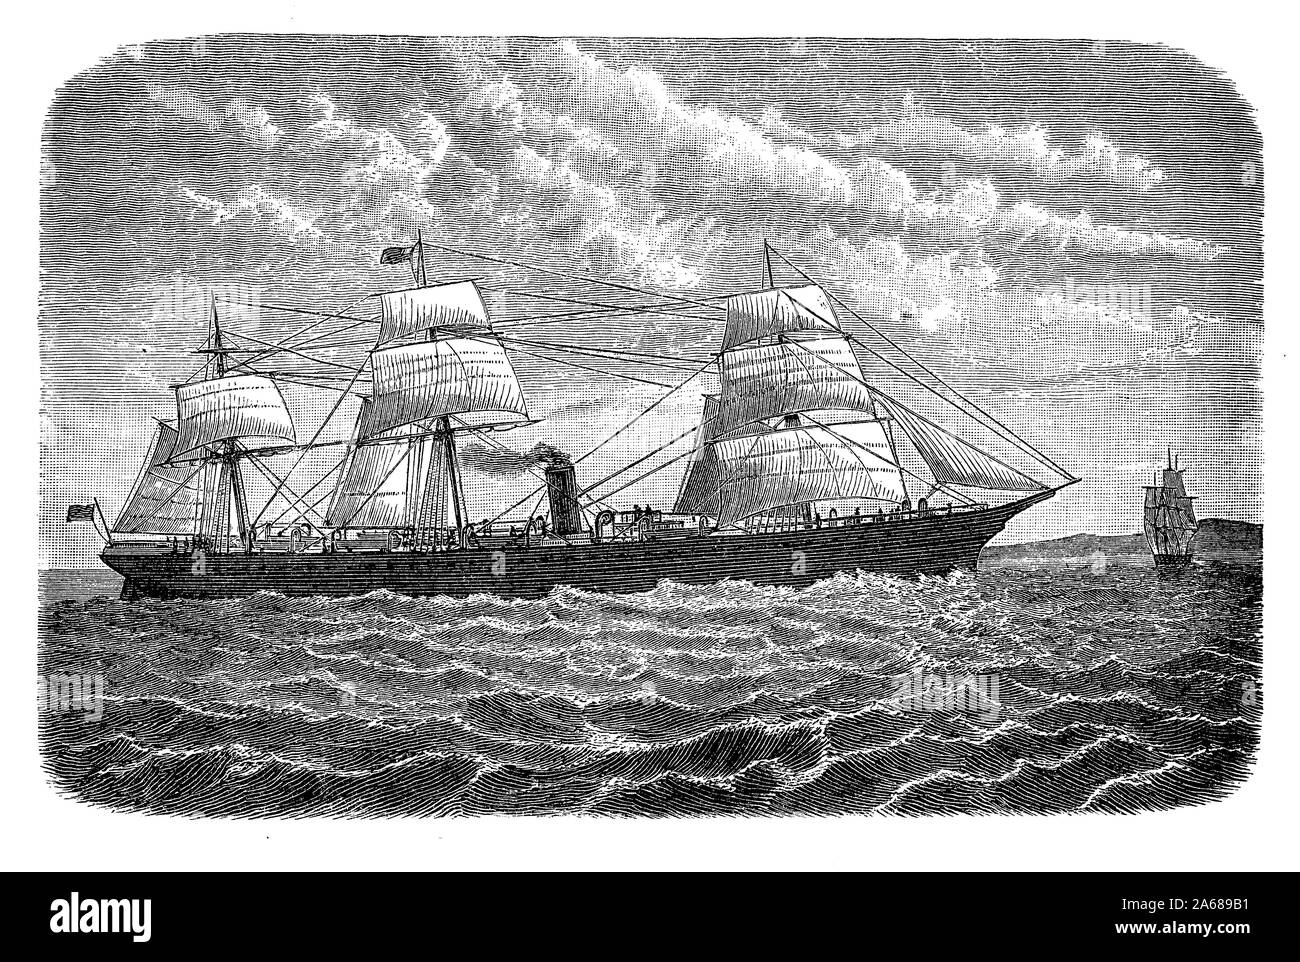 19th century transatlantic cargo steamer  across the Atlantic Ocean between Western Europe and North America Stock Photo